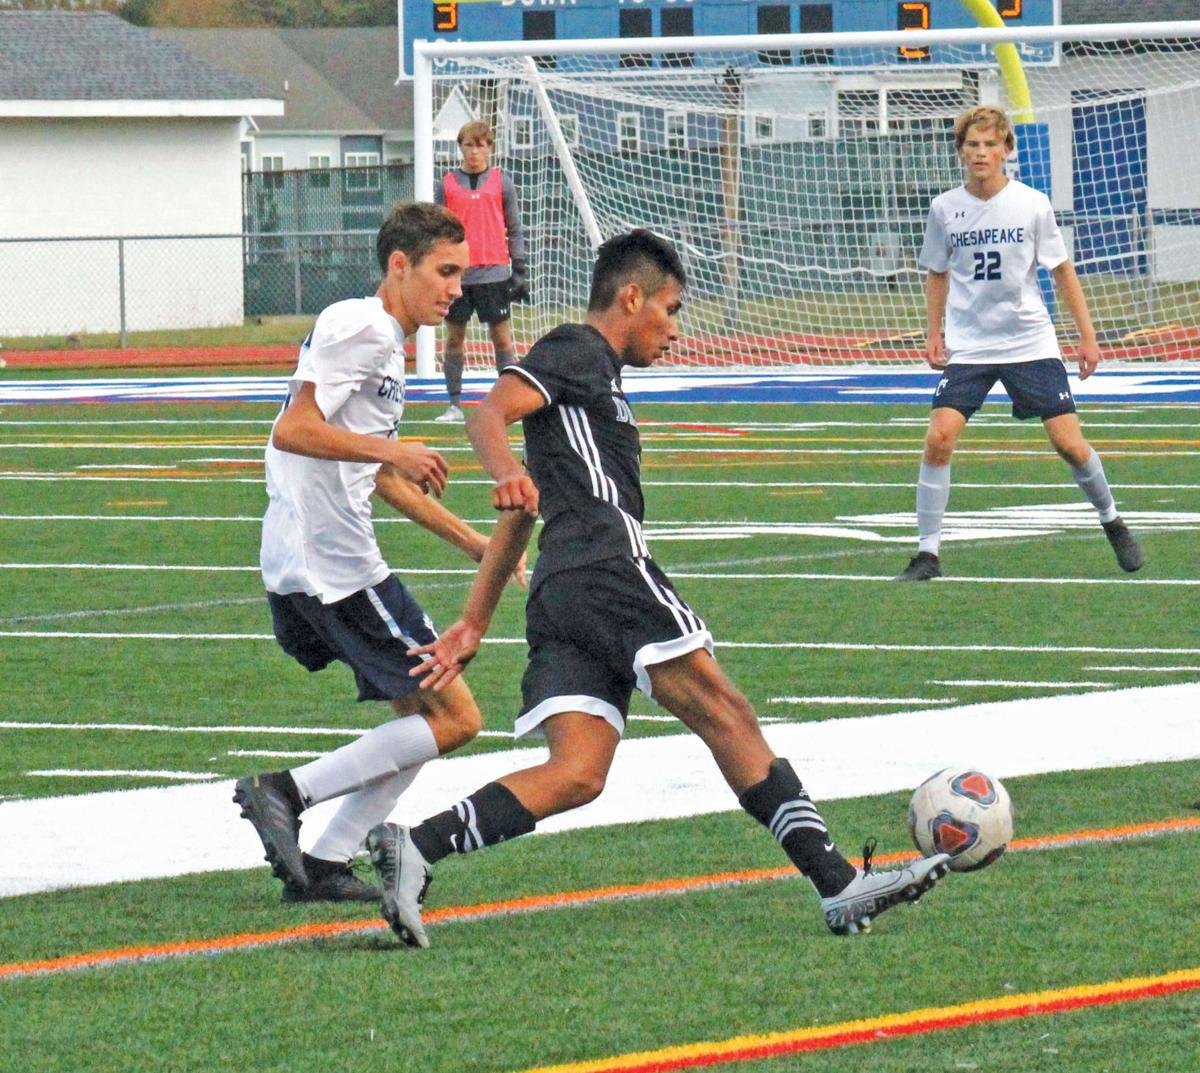 SD boys soccer 1 11819